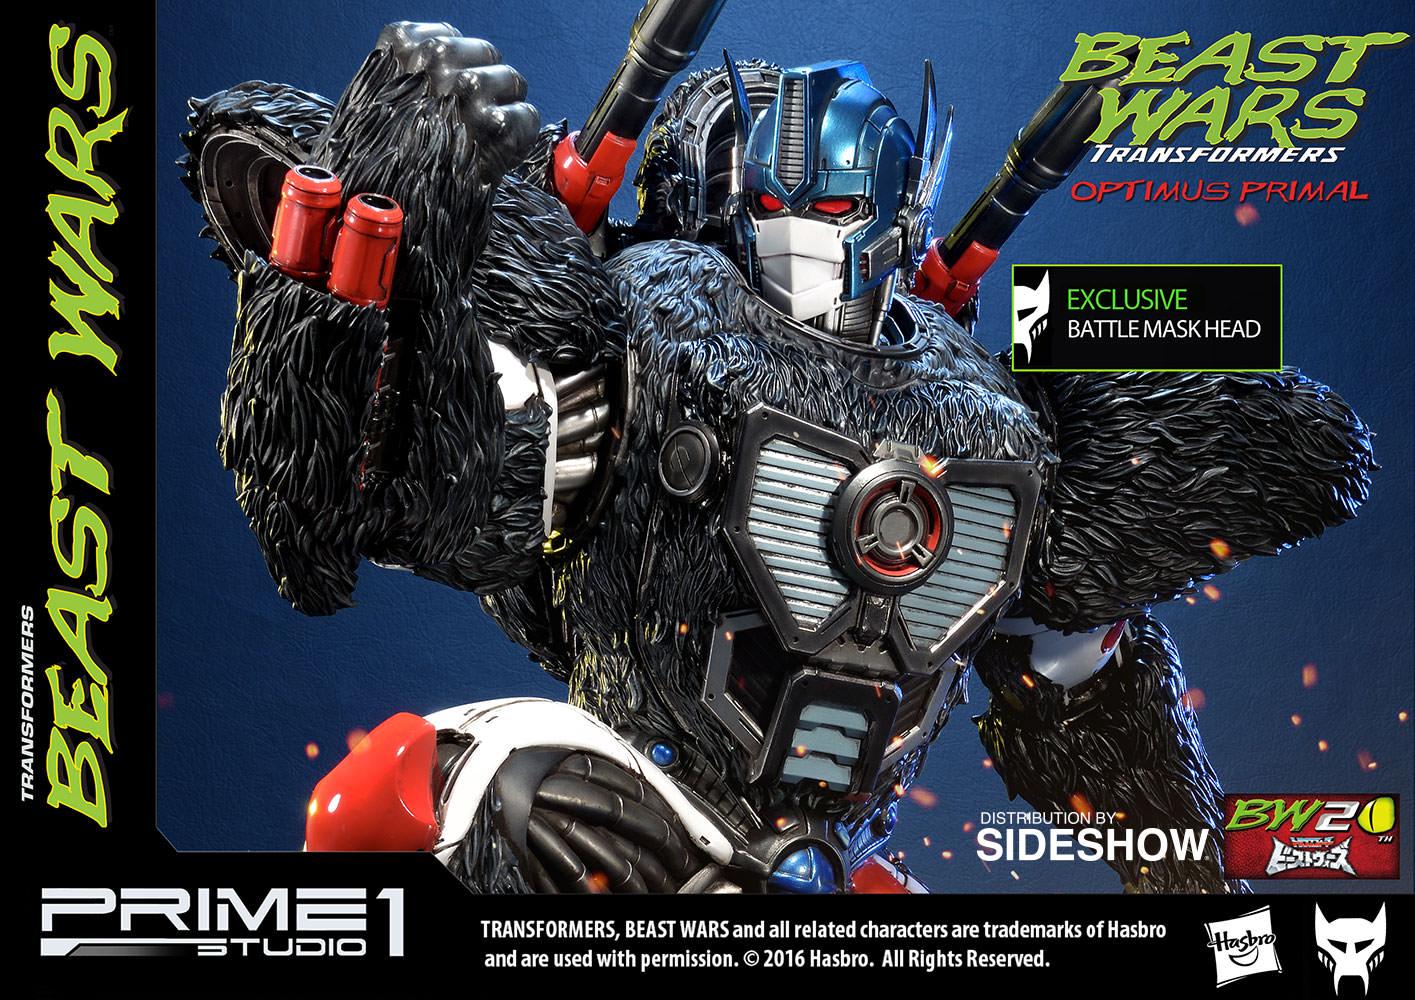 Prime 1 Studios Transformers Beast Wars Optimus Primal Statue Pre-Orders